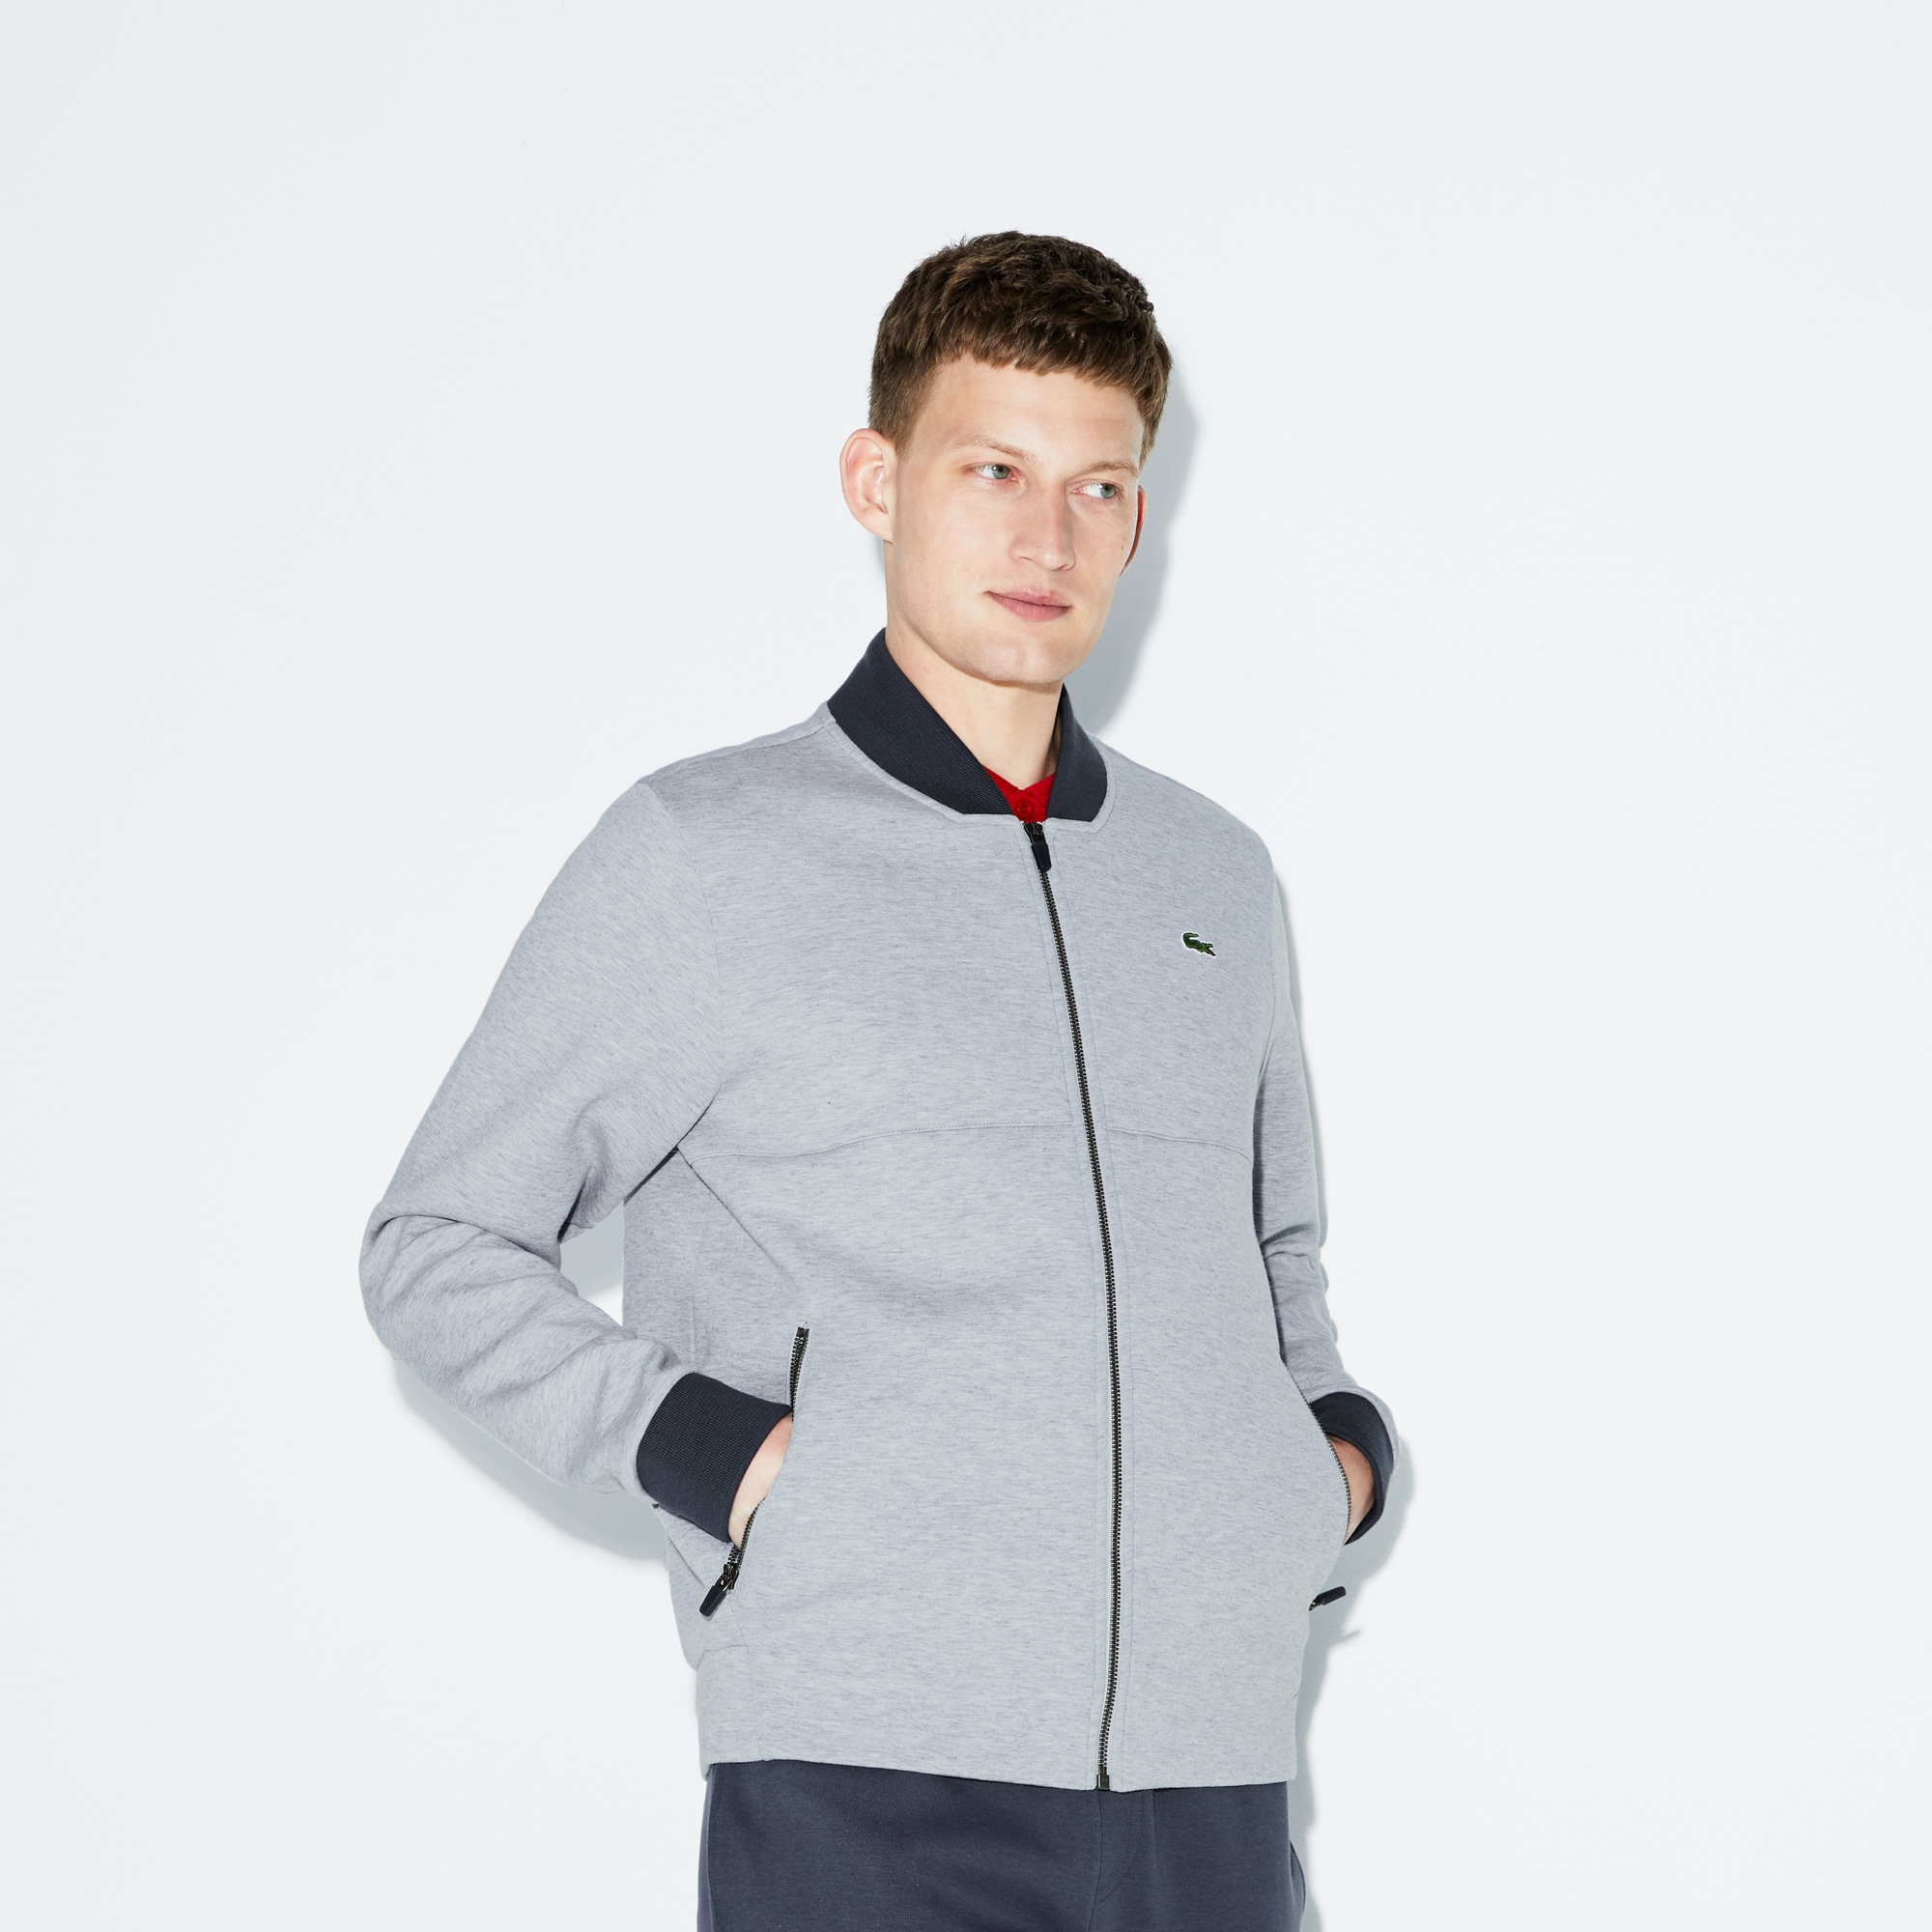 Lacoste SPORT男士香蕉领拉链抓绒网球运动衫